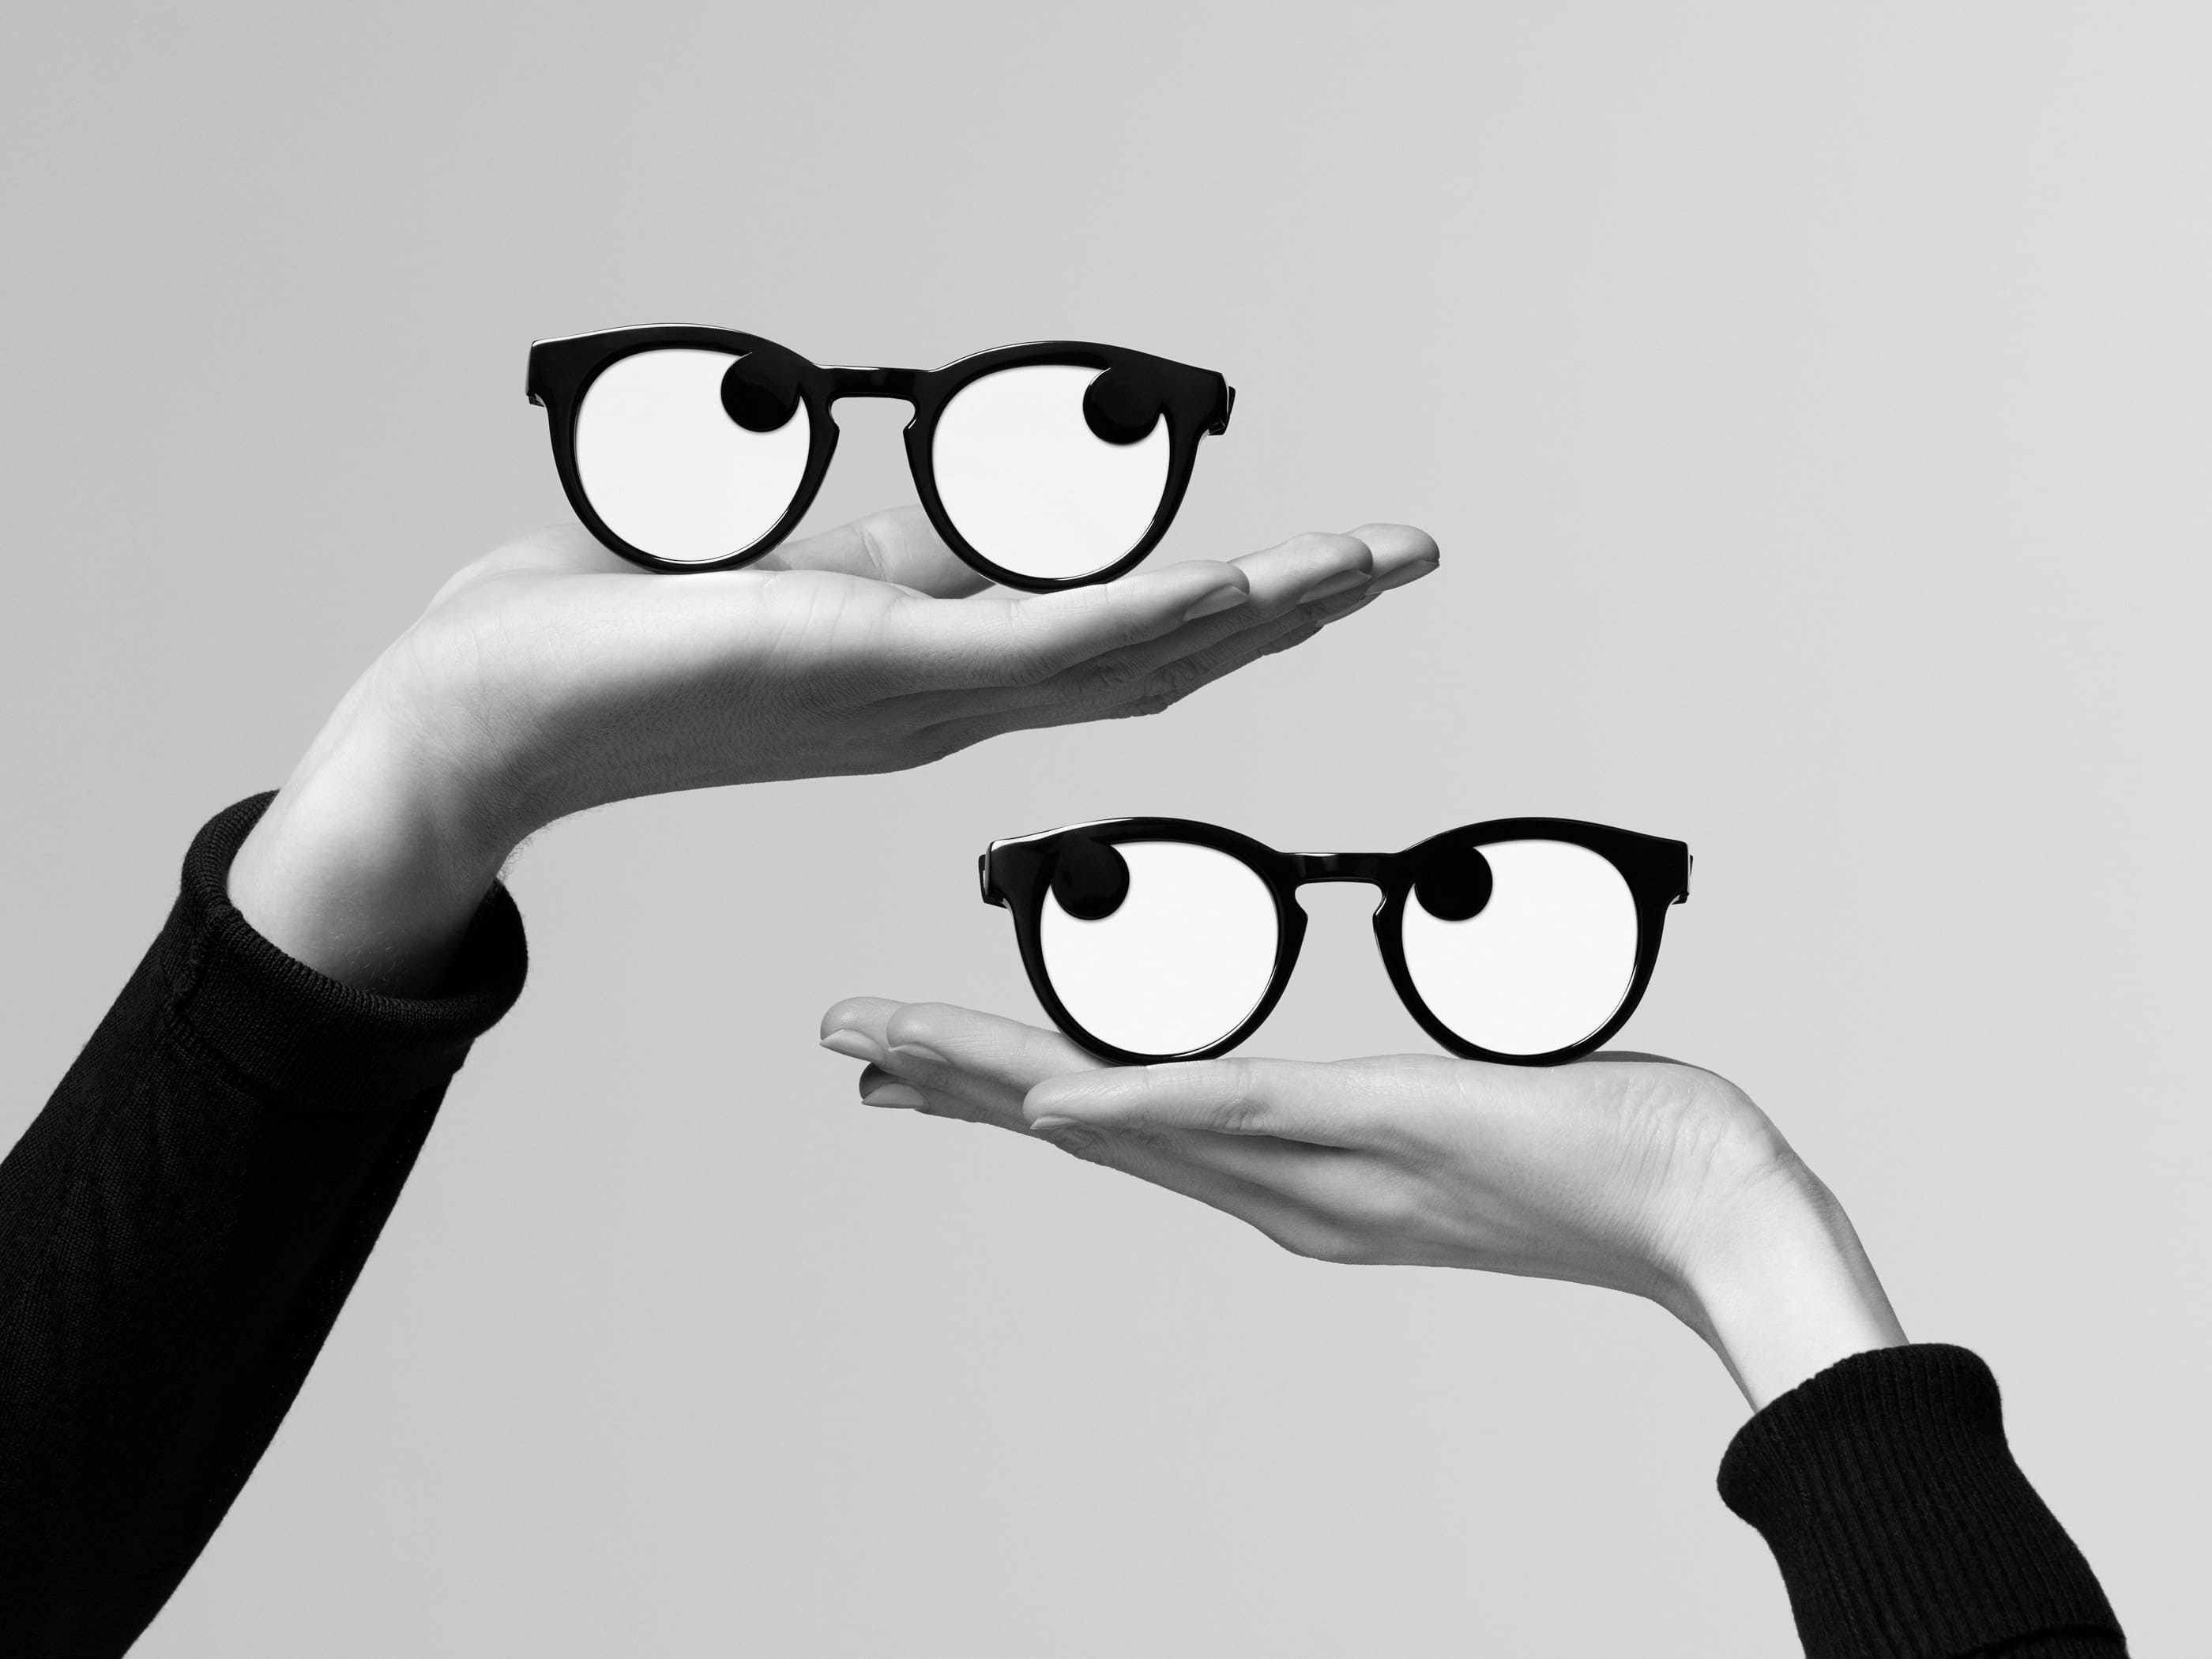 Studio Sander Plug – Ace & Tate - Rolling Eyes